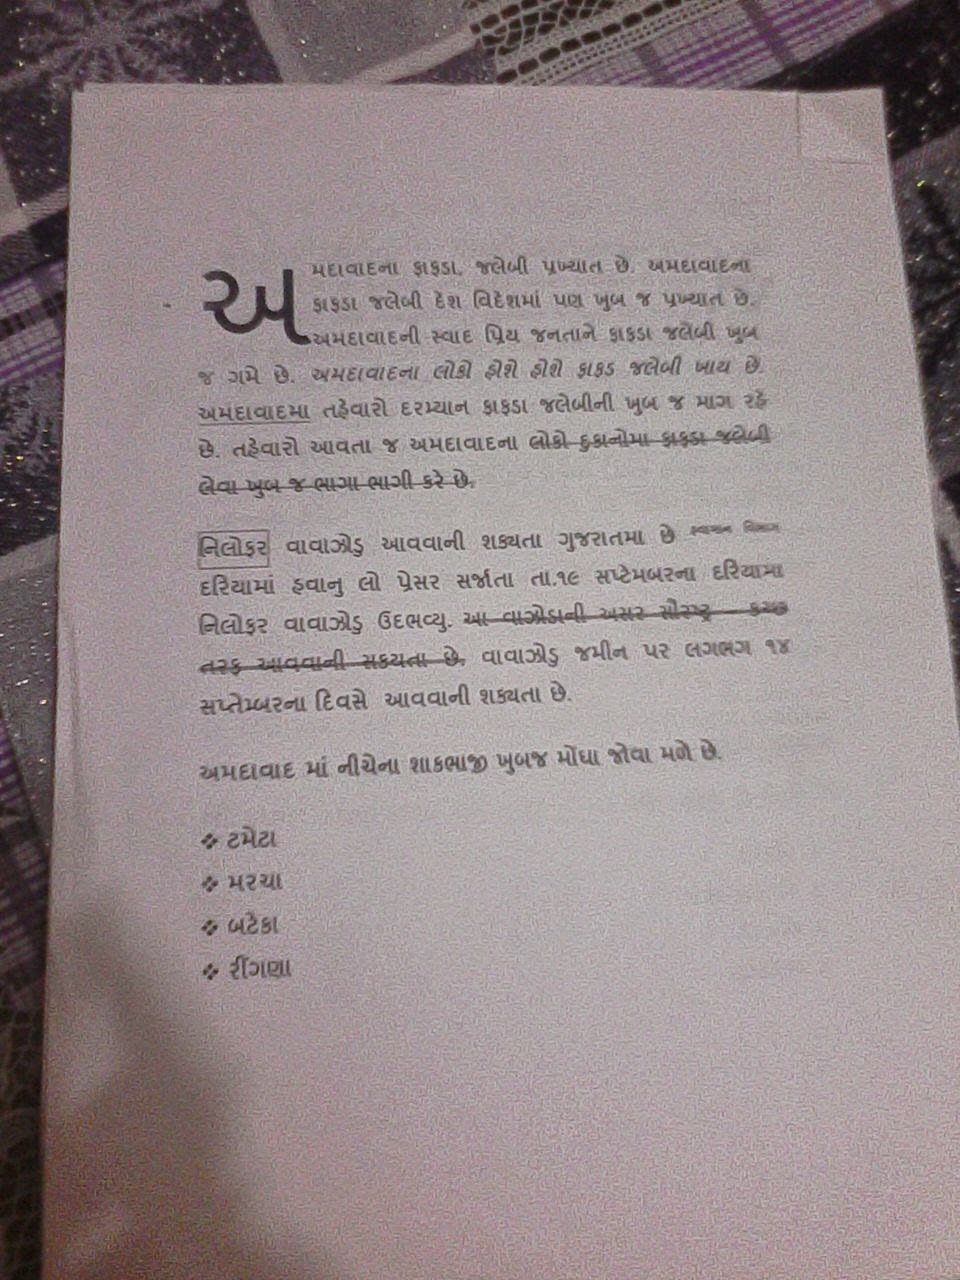 Practice paragraph typing array aras paras badli gtu ccc exam gujarati fakro rh jnpatel09 blogspot com fandeluxe Image collections